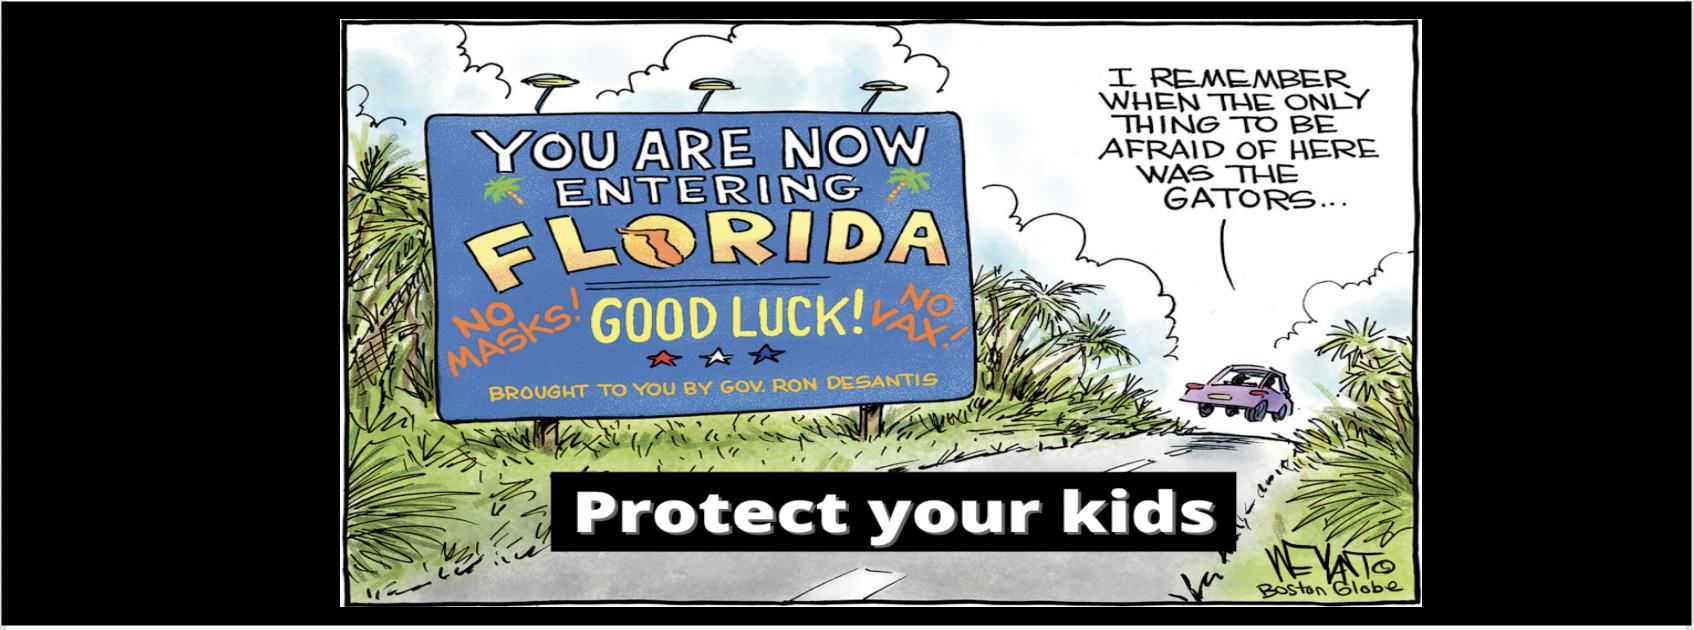 DeSantis plays politics with the lives of schoolchildren in Florida.